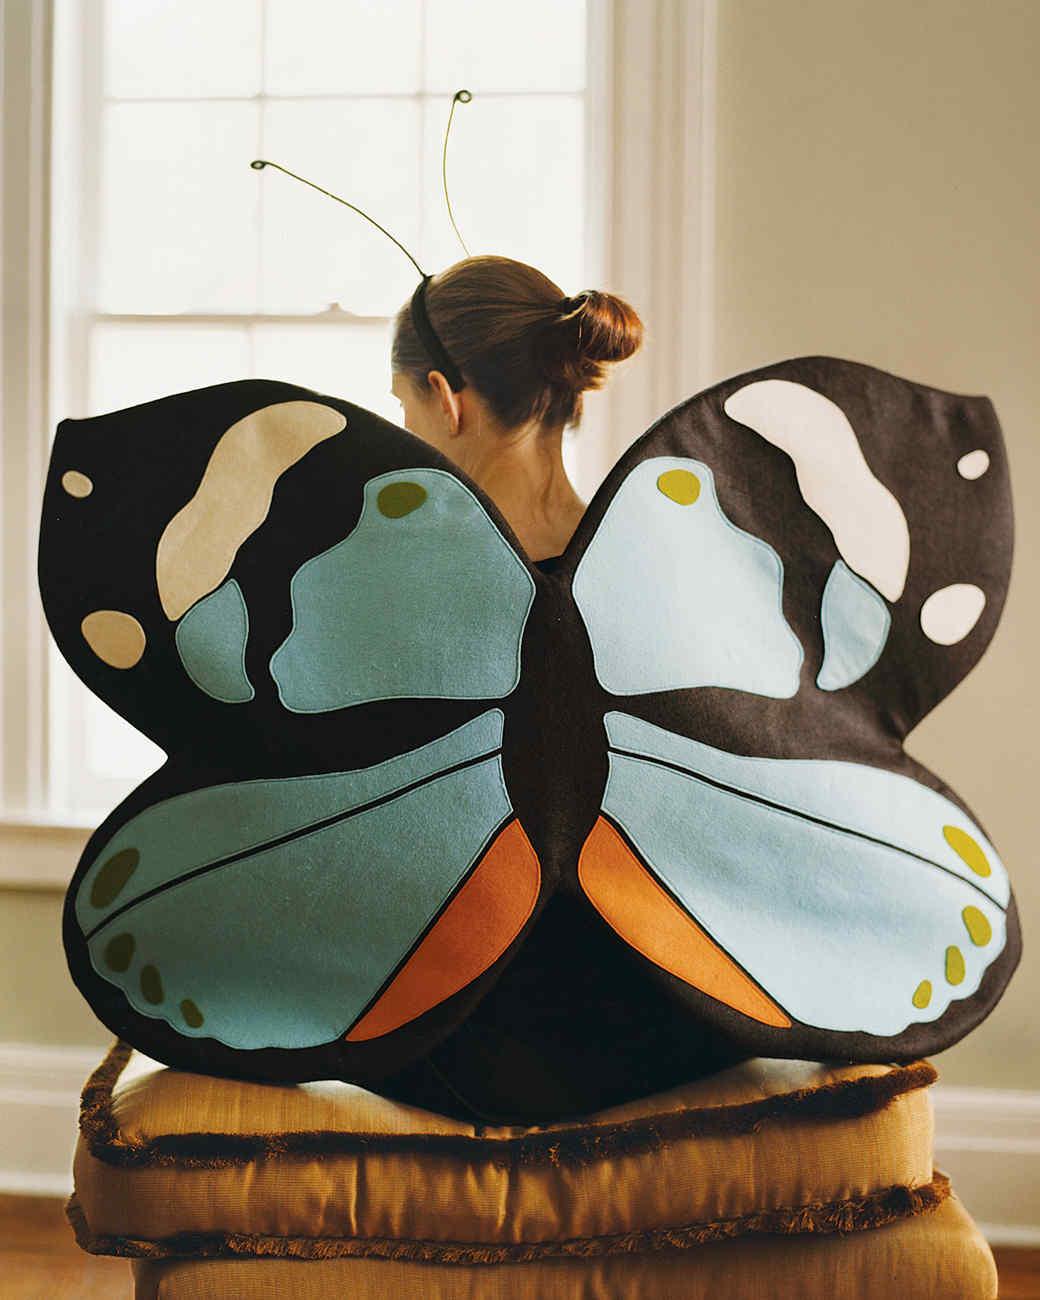 madam-butterfly-1010sip09076.jpg